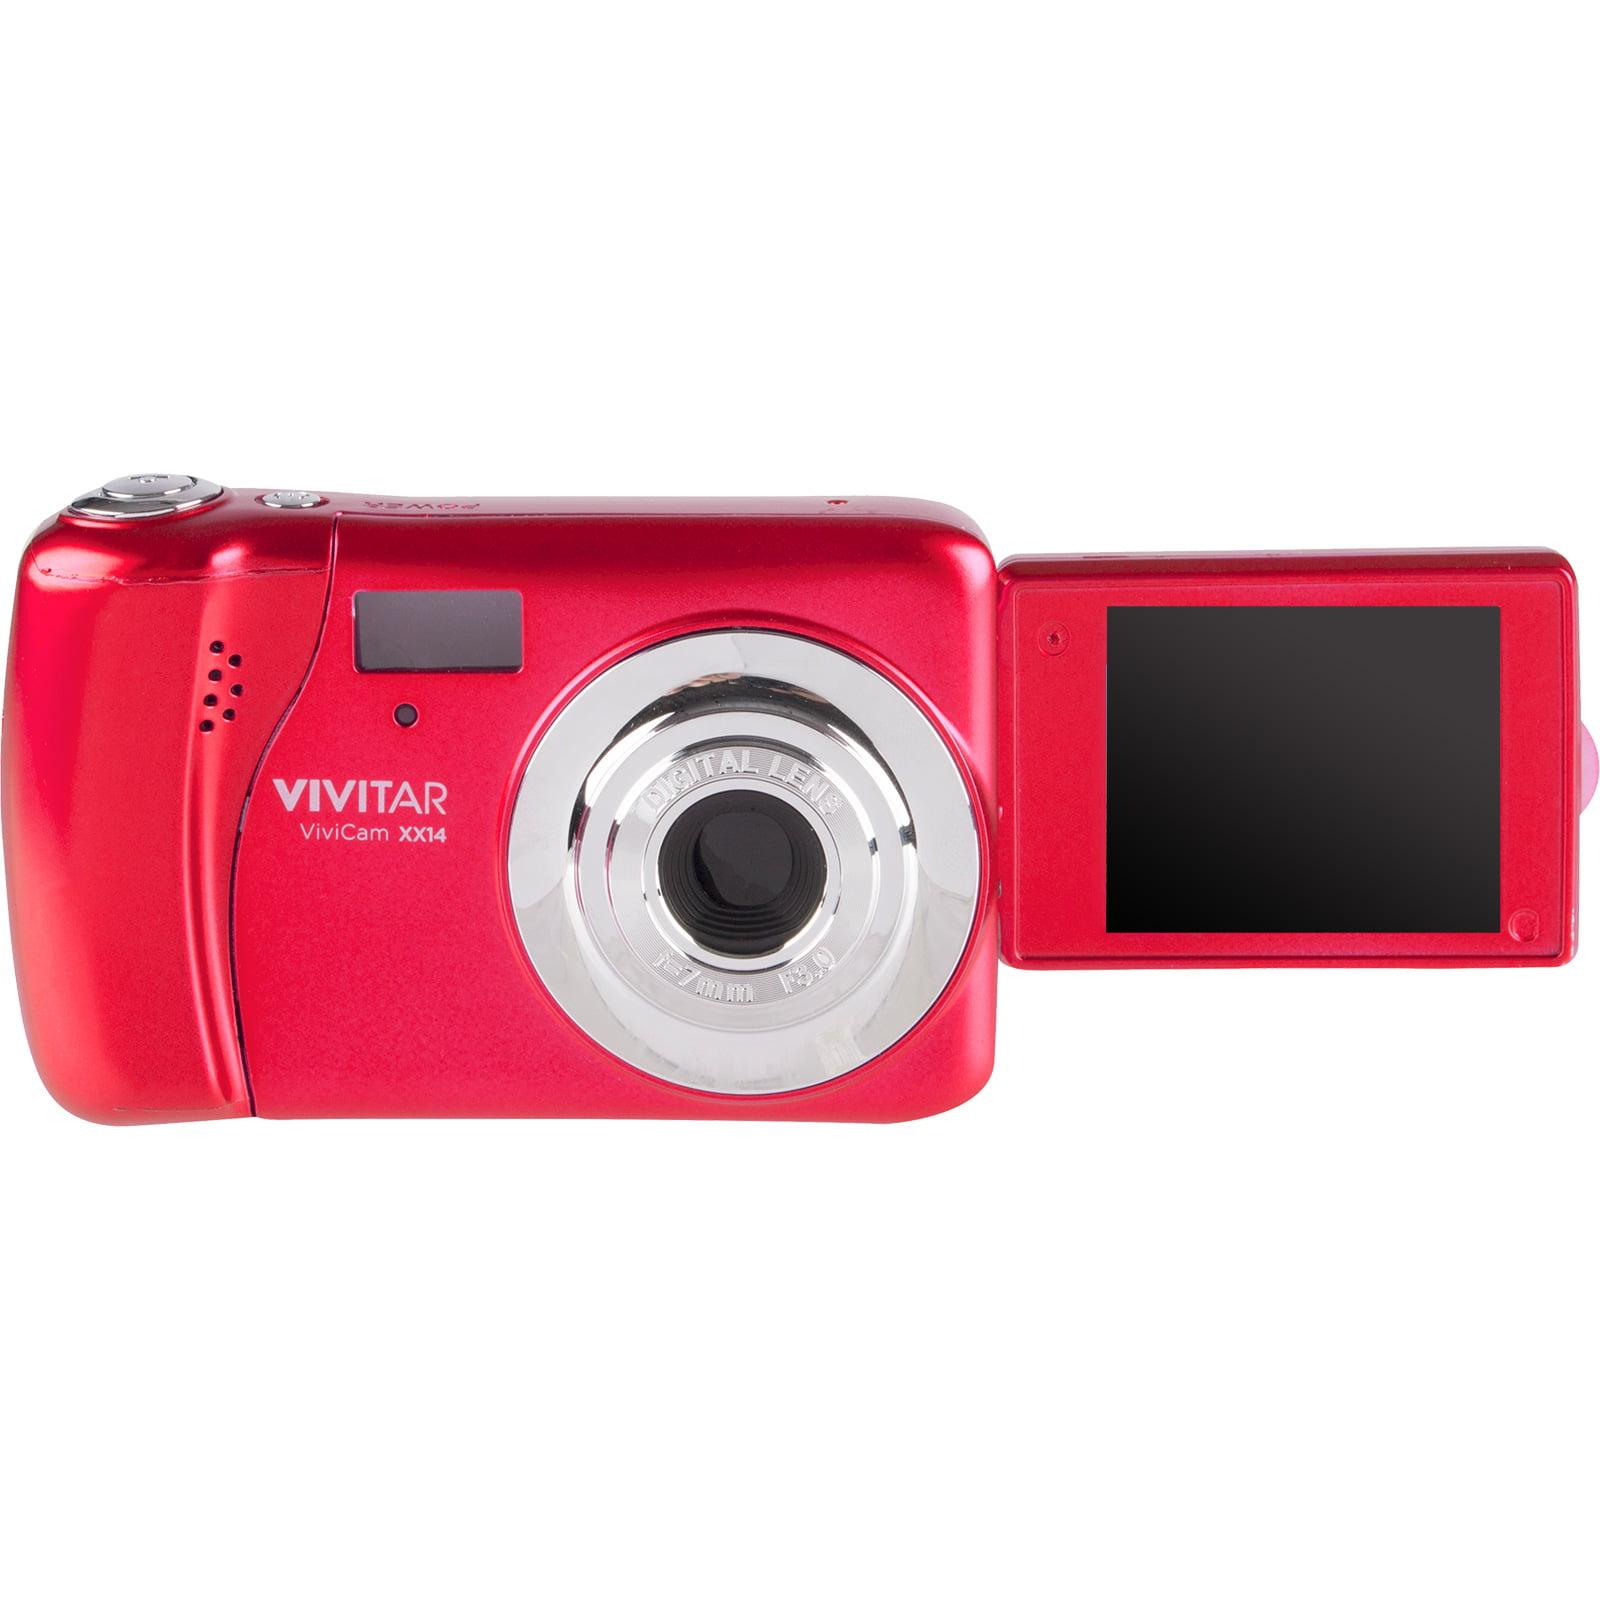 Vivitar ViviCam VXX14 Selfie Digital Camera (Red) with 16GB Card + Case + Tripod + Reader + Kit by Vivitar